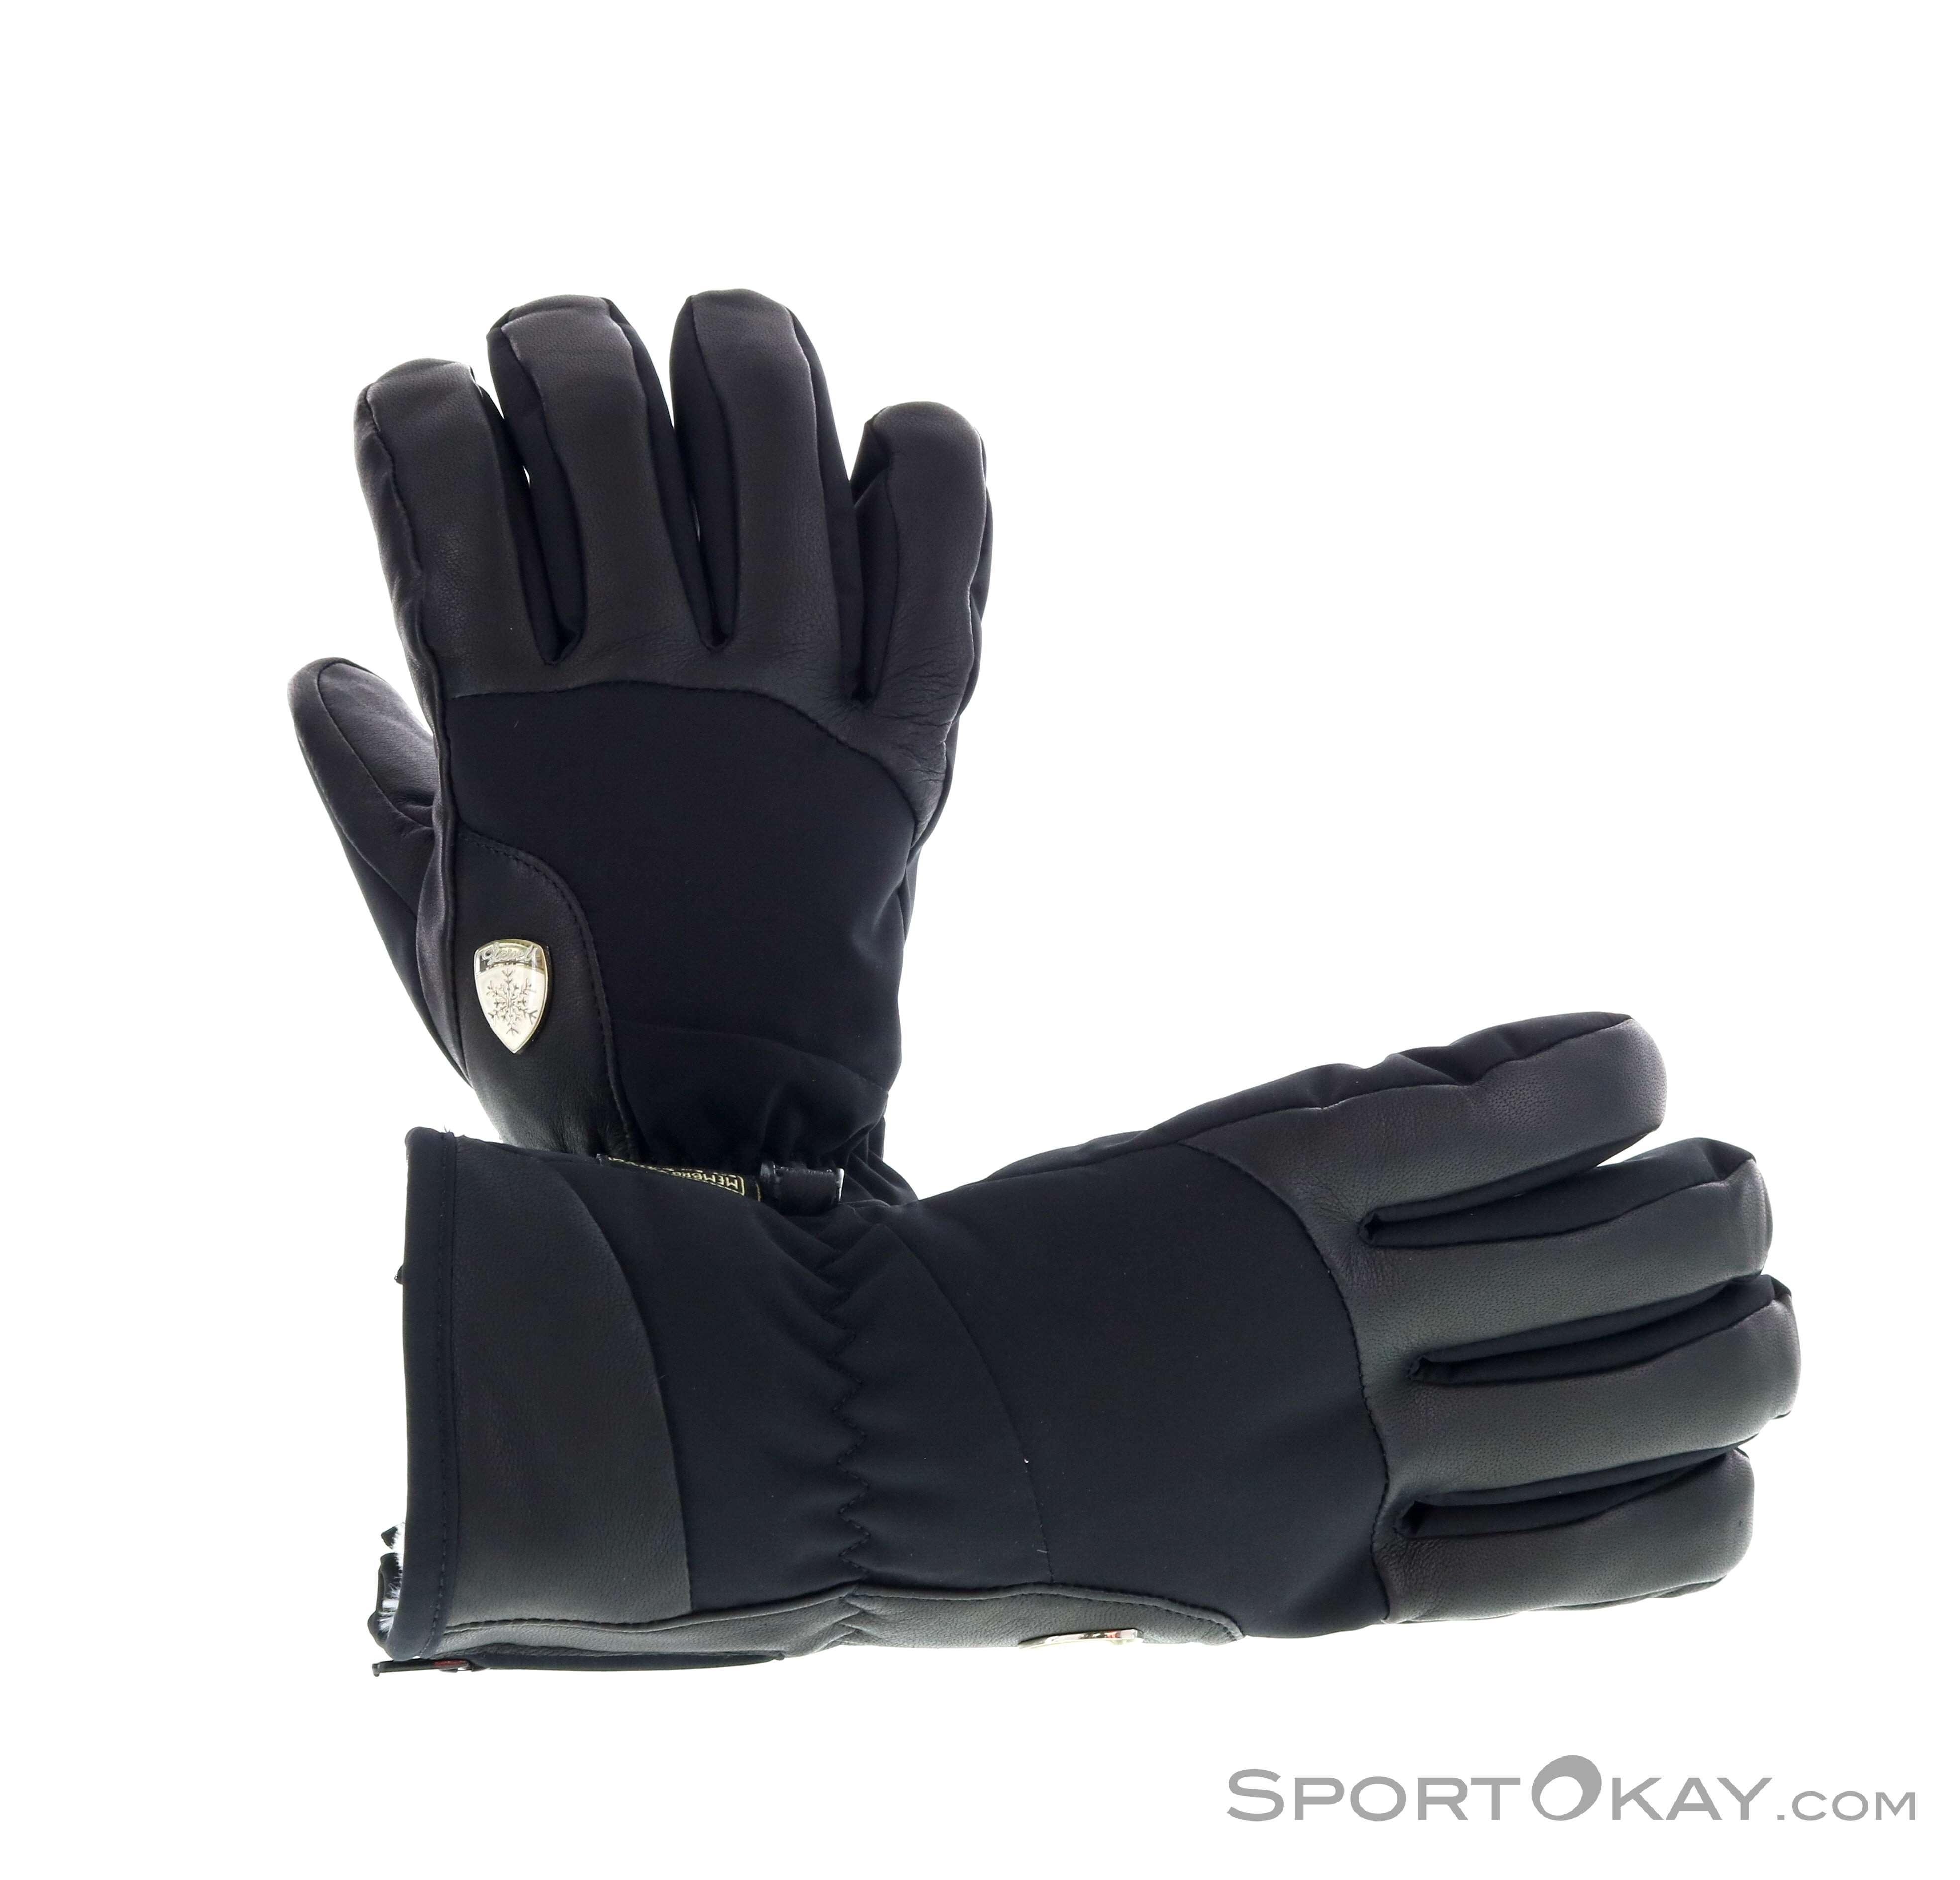 Level Iris Handschuhe-Schwarz-7,5